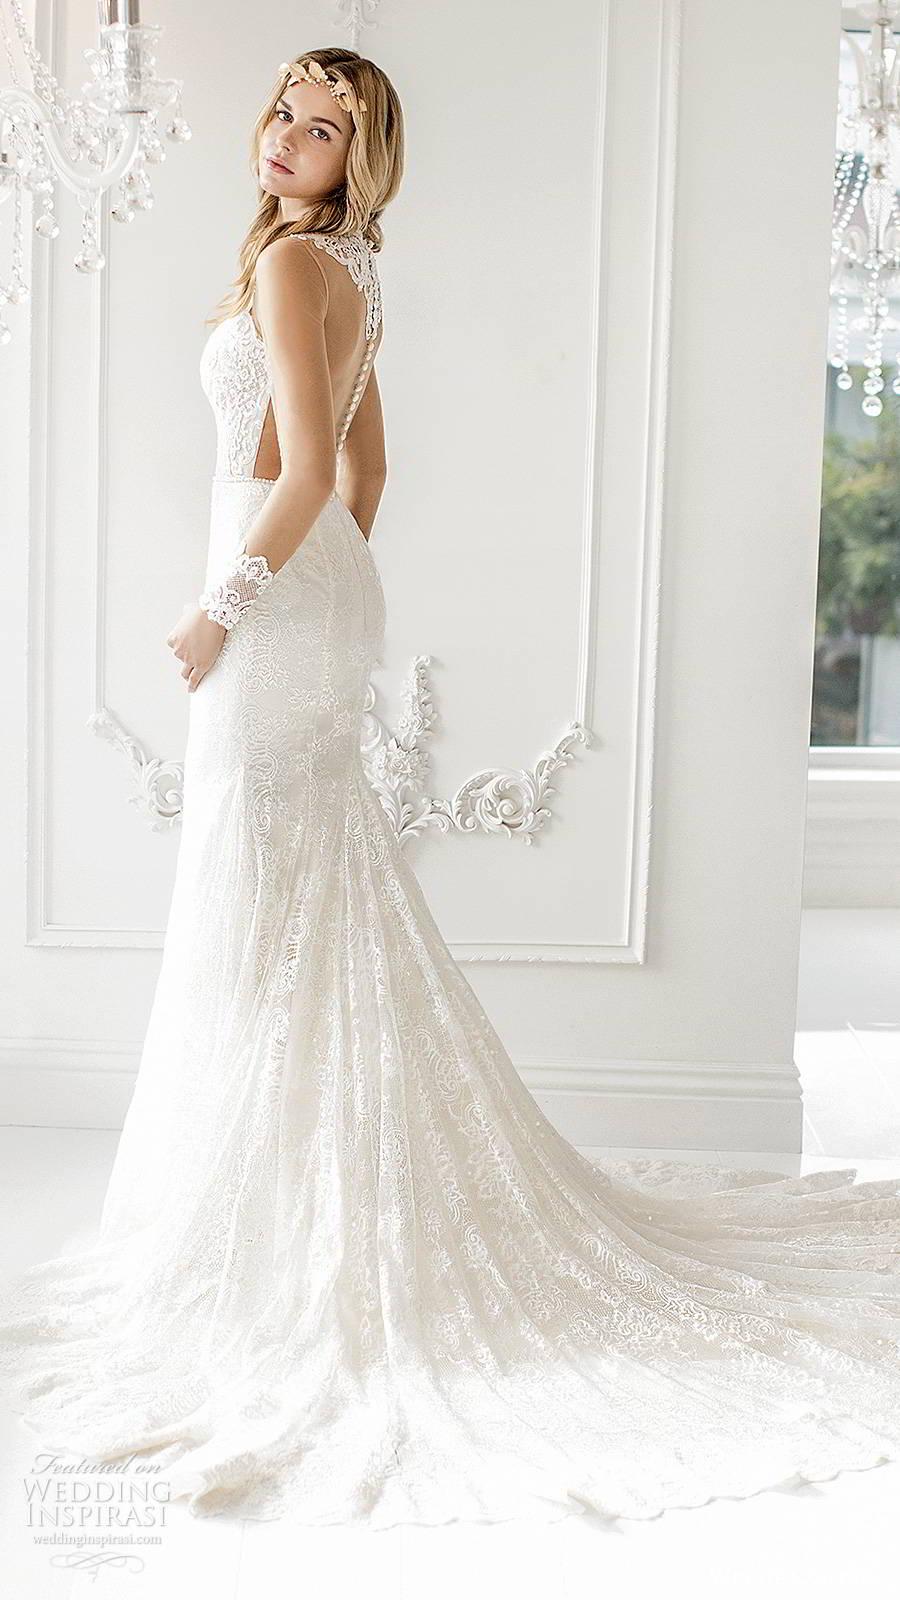 winnie couture 2019 bridal illusion long sleeves jewel necklne cutout bodice fully embellished lace elegant fit flare mermaid wedding dress sheer back chapel train (1) sv